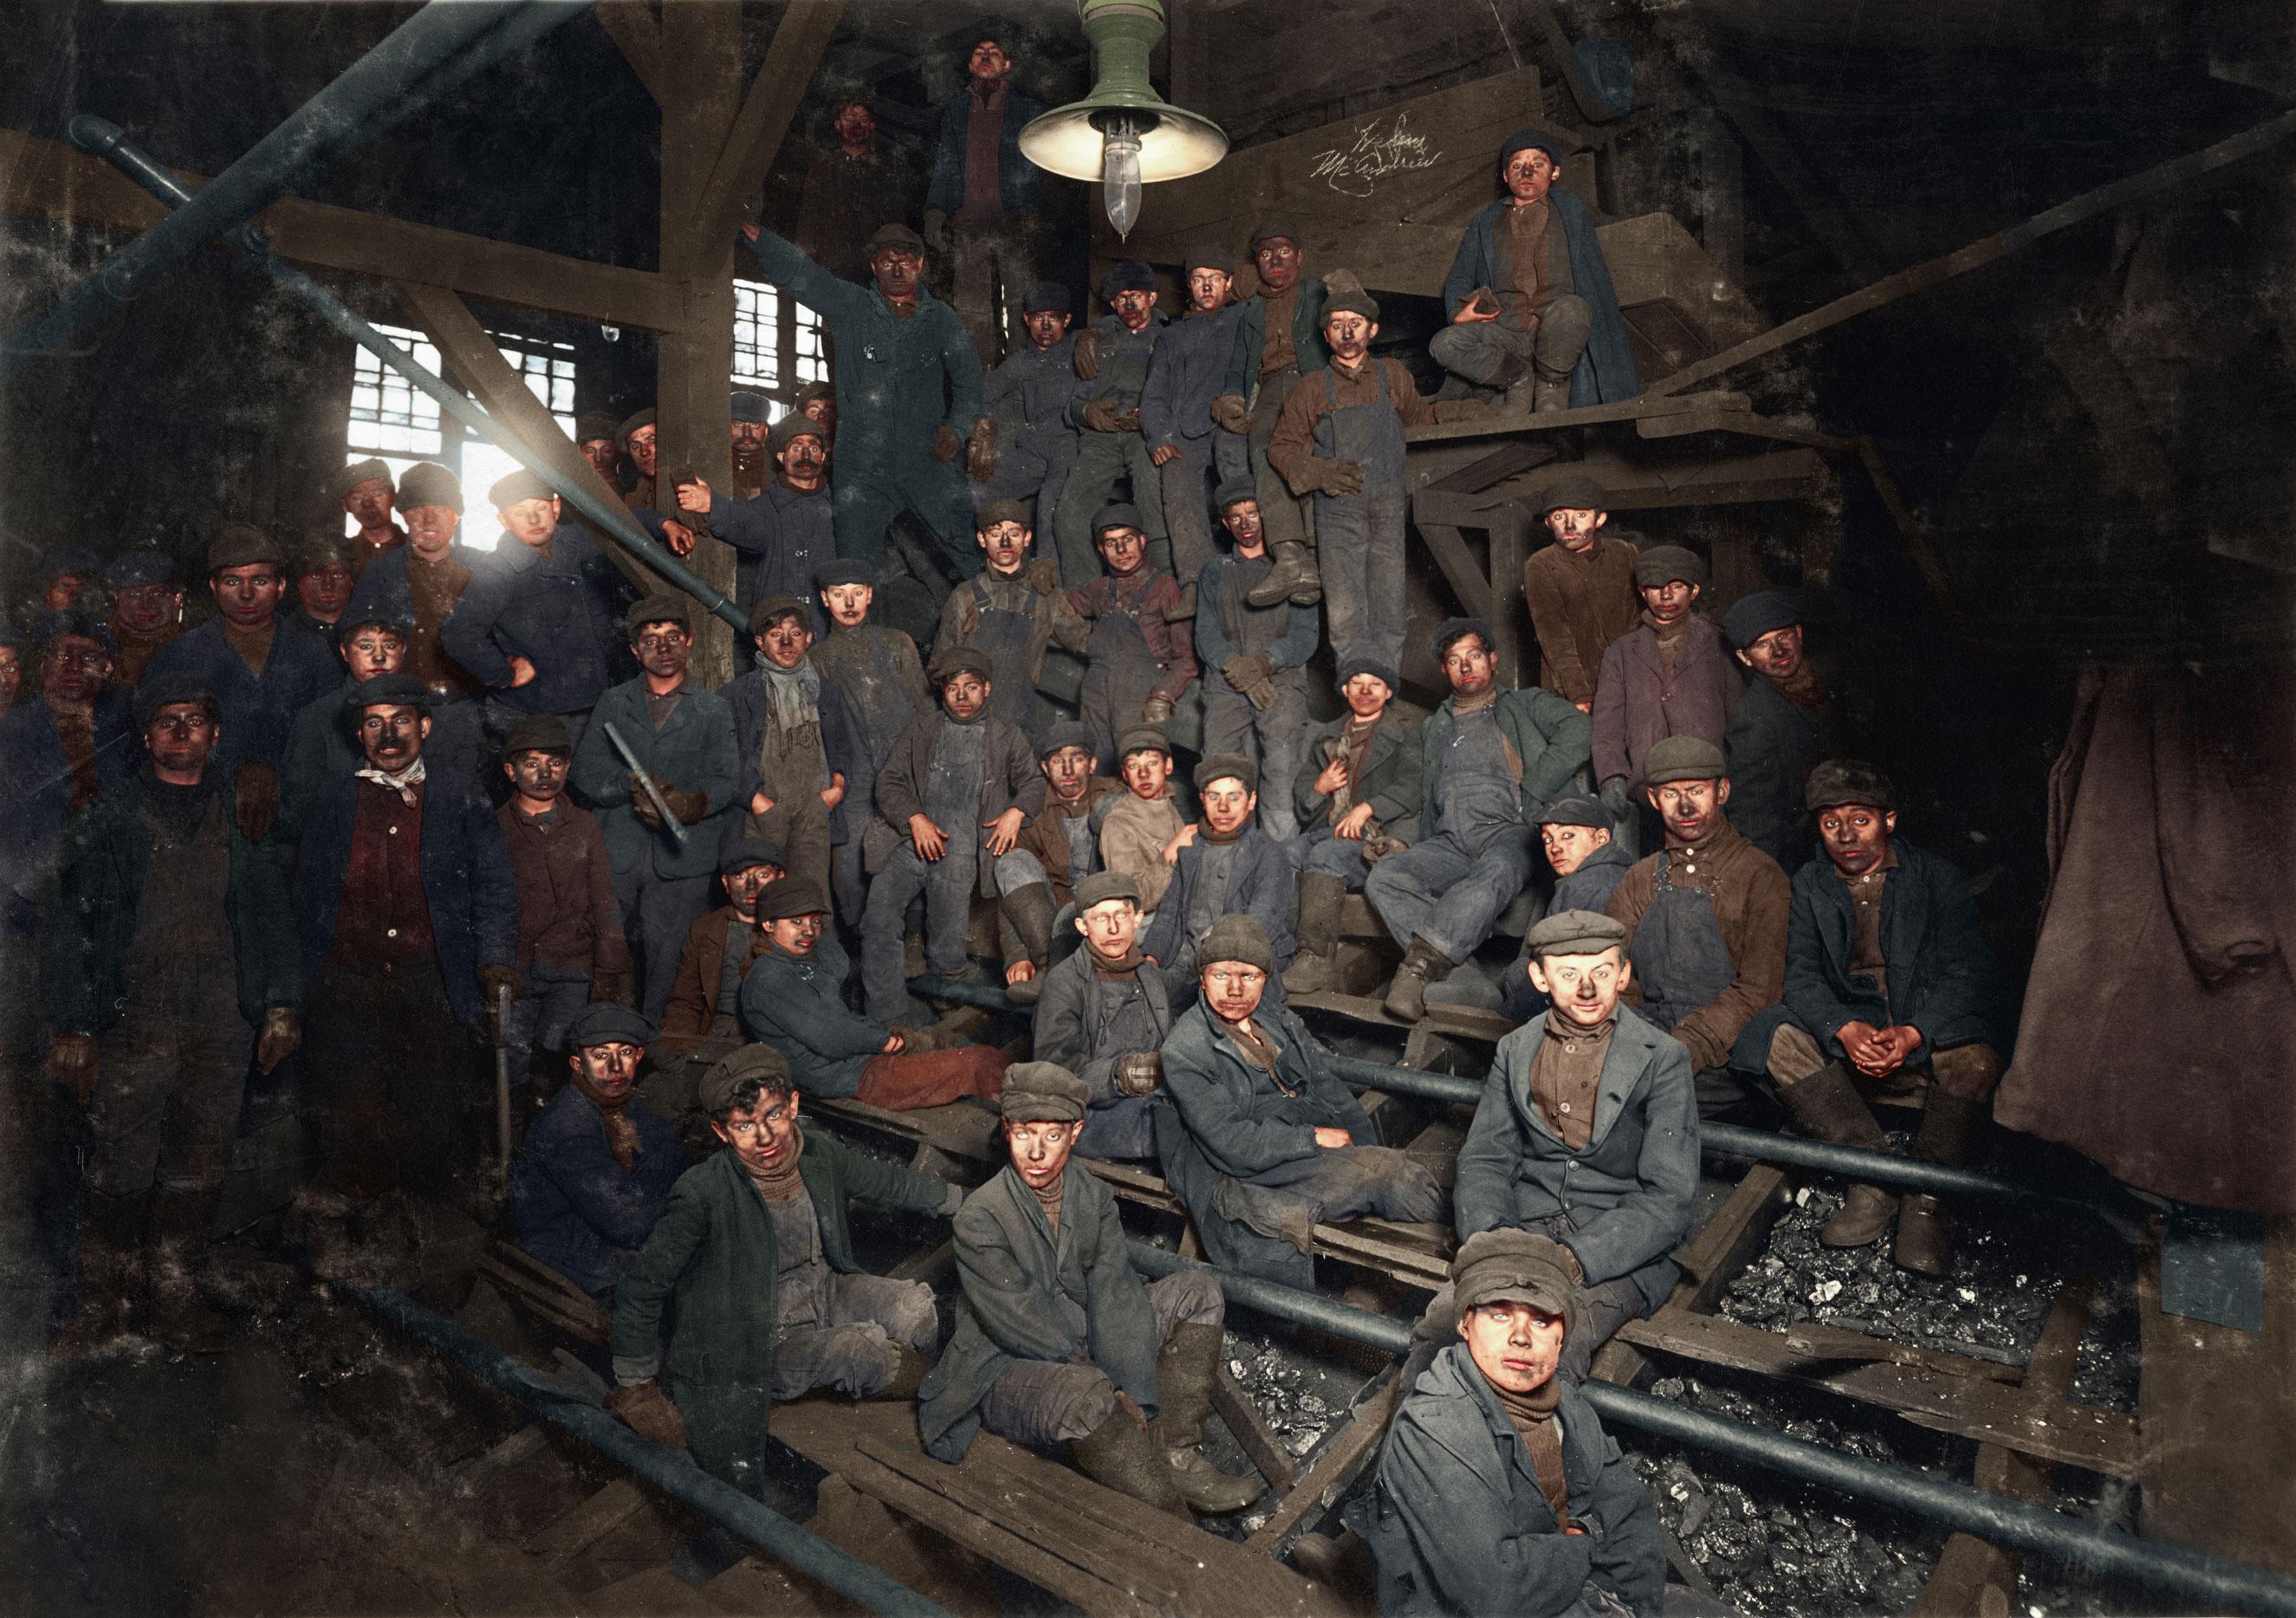 Noon hour in the Ewen Breaker, Pennsylvania Coal Co. Jan. 1911. South Pittston, Pennsylvania.